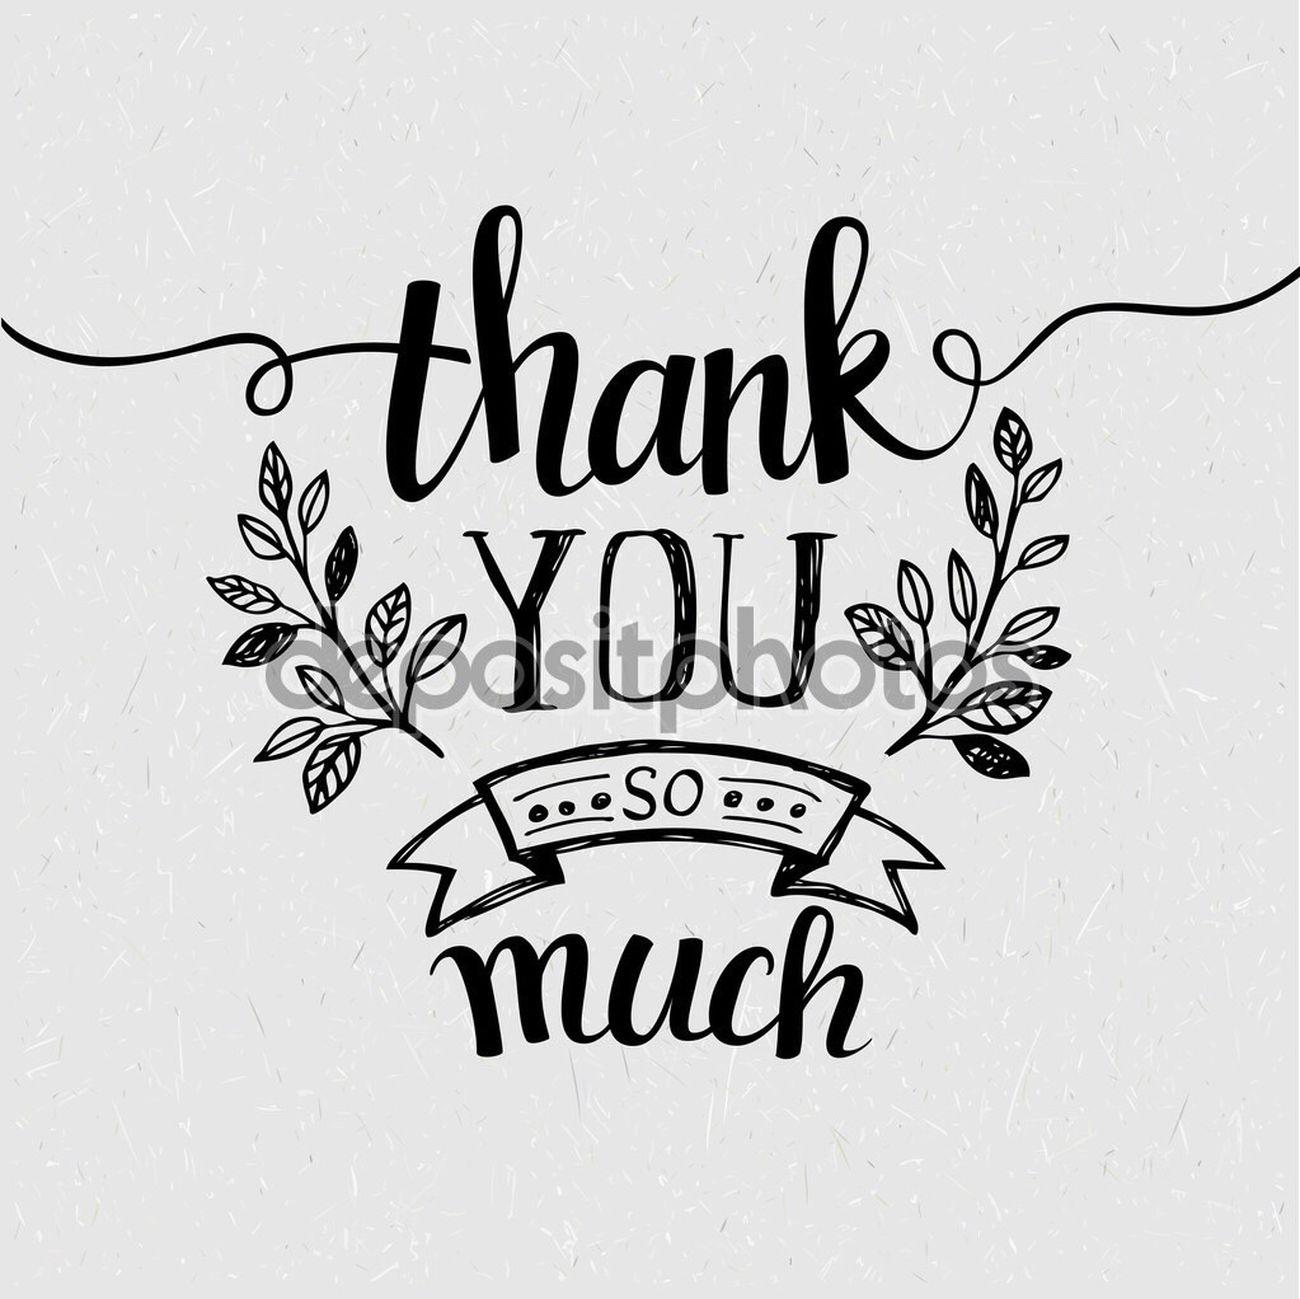 That's amazing....🦄 Text Close-up Communication No People Paper Outdoors Exclamation Point Day Schriftzug Schrift Danke  Dank Dankeschön Danke Schön Danke ;) Thankyou Thanks